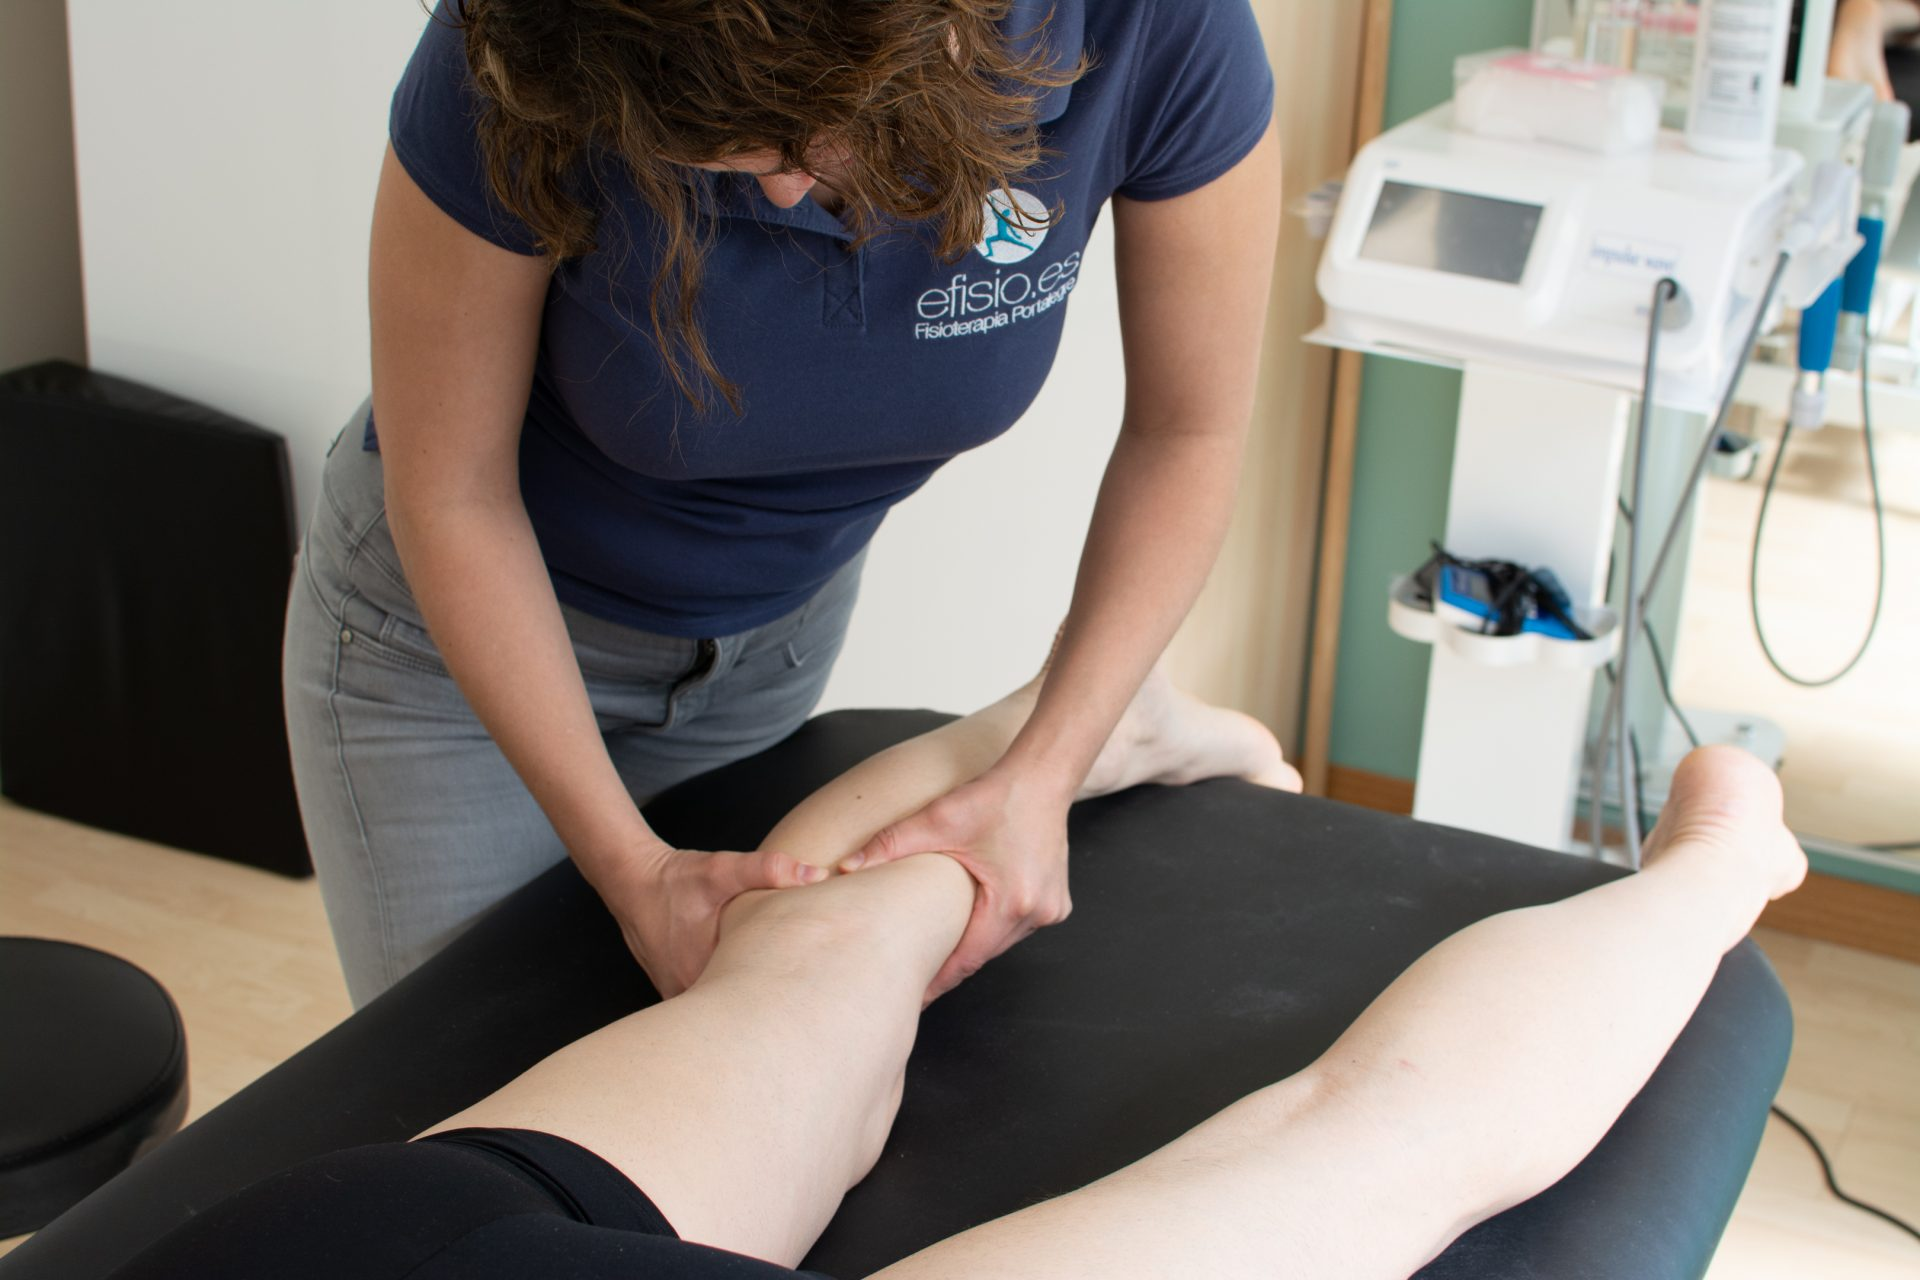 Técnias de terapia manual ortopédica